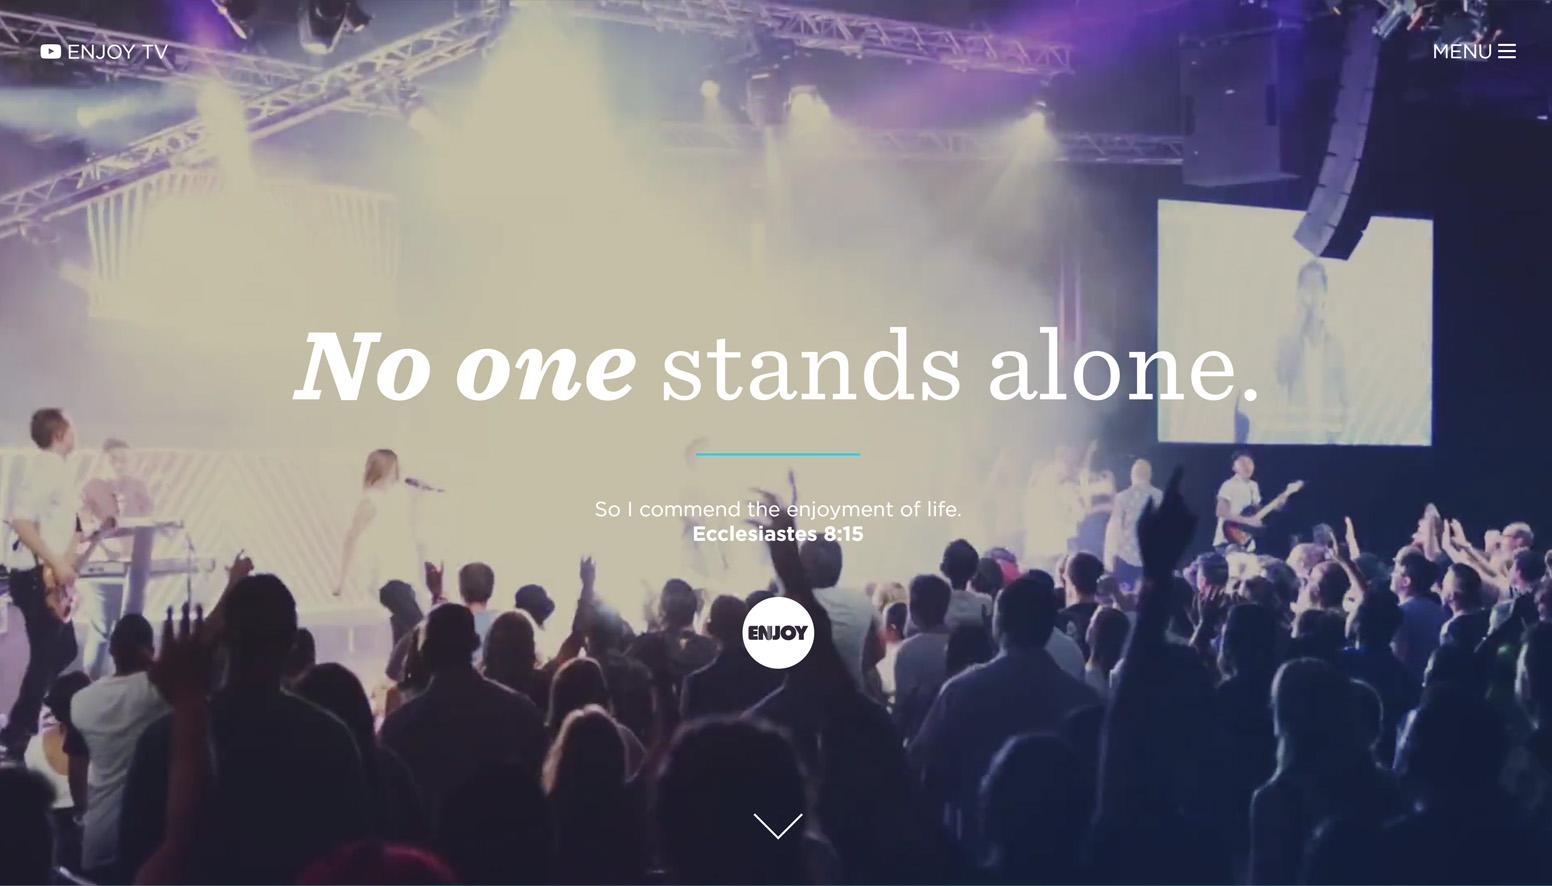 Enjoy Church Website Example